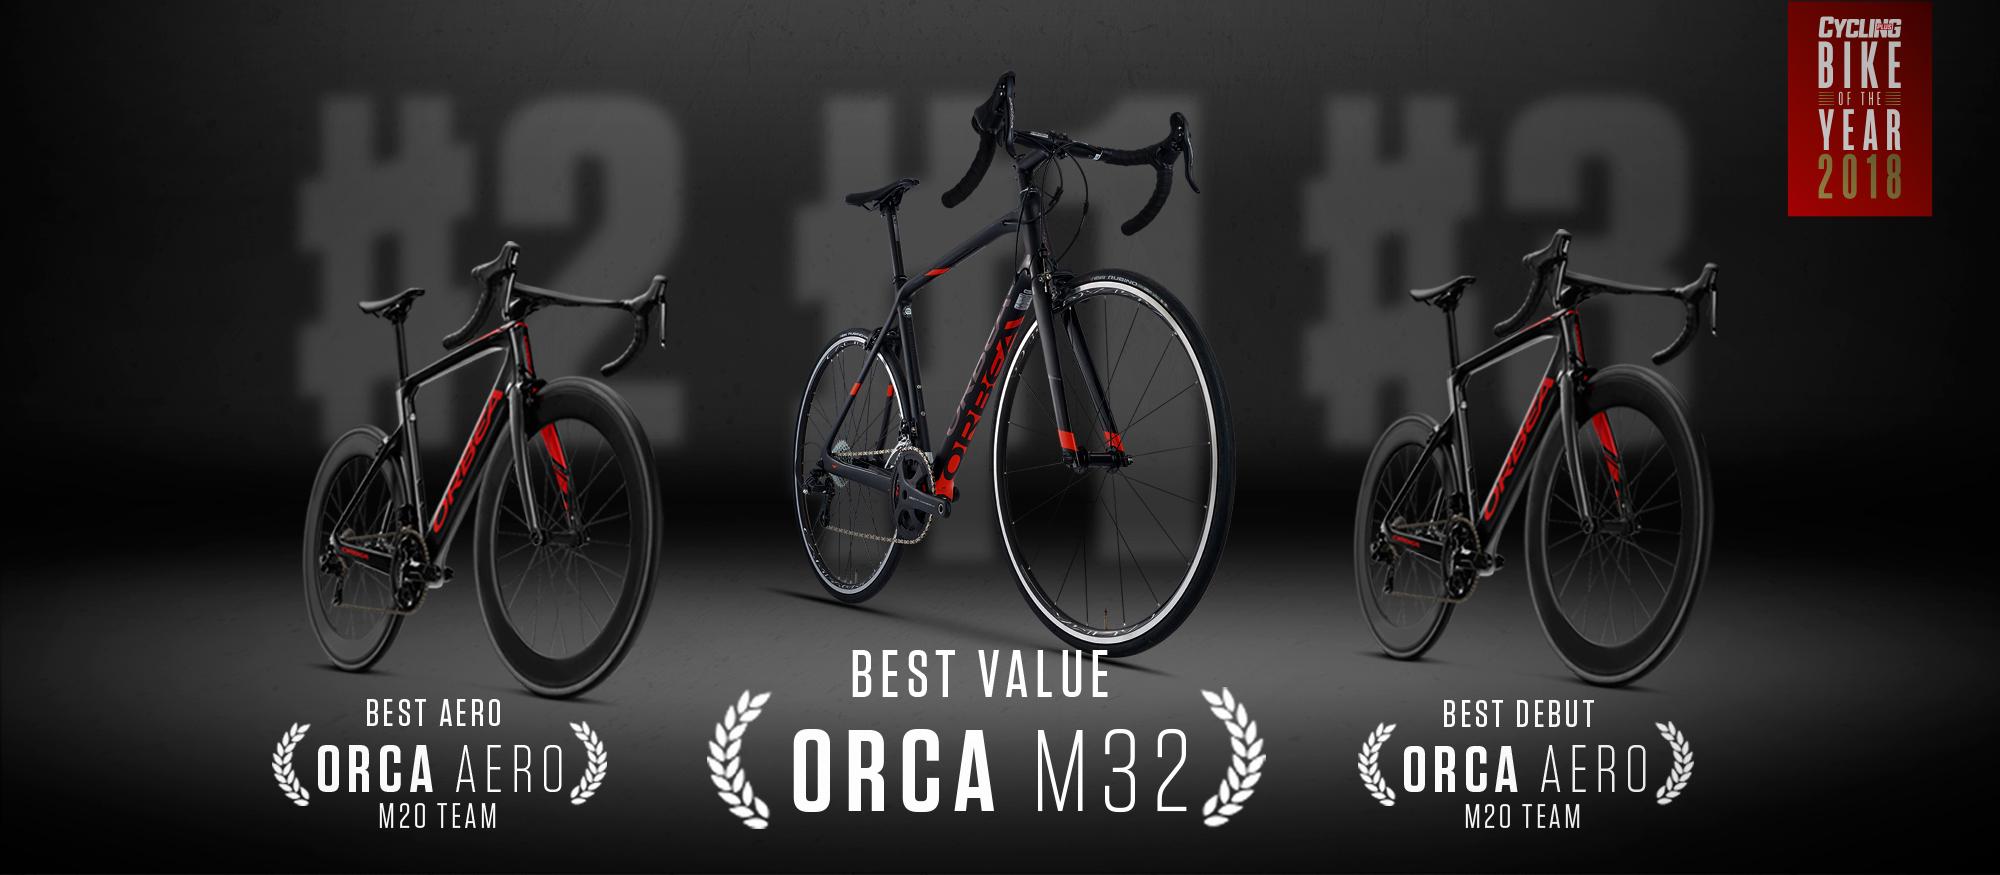 we're bike of the year in the united kingdom! — orbea